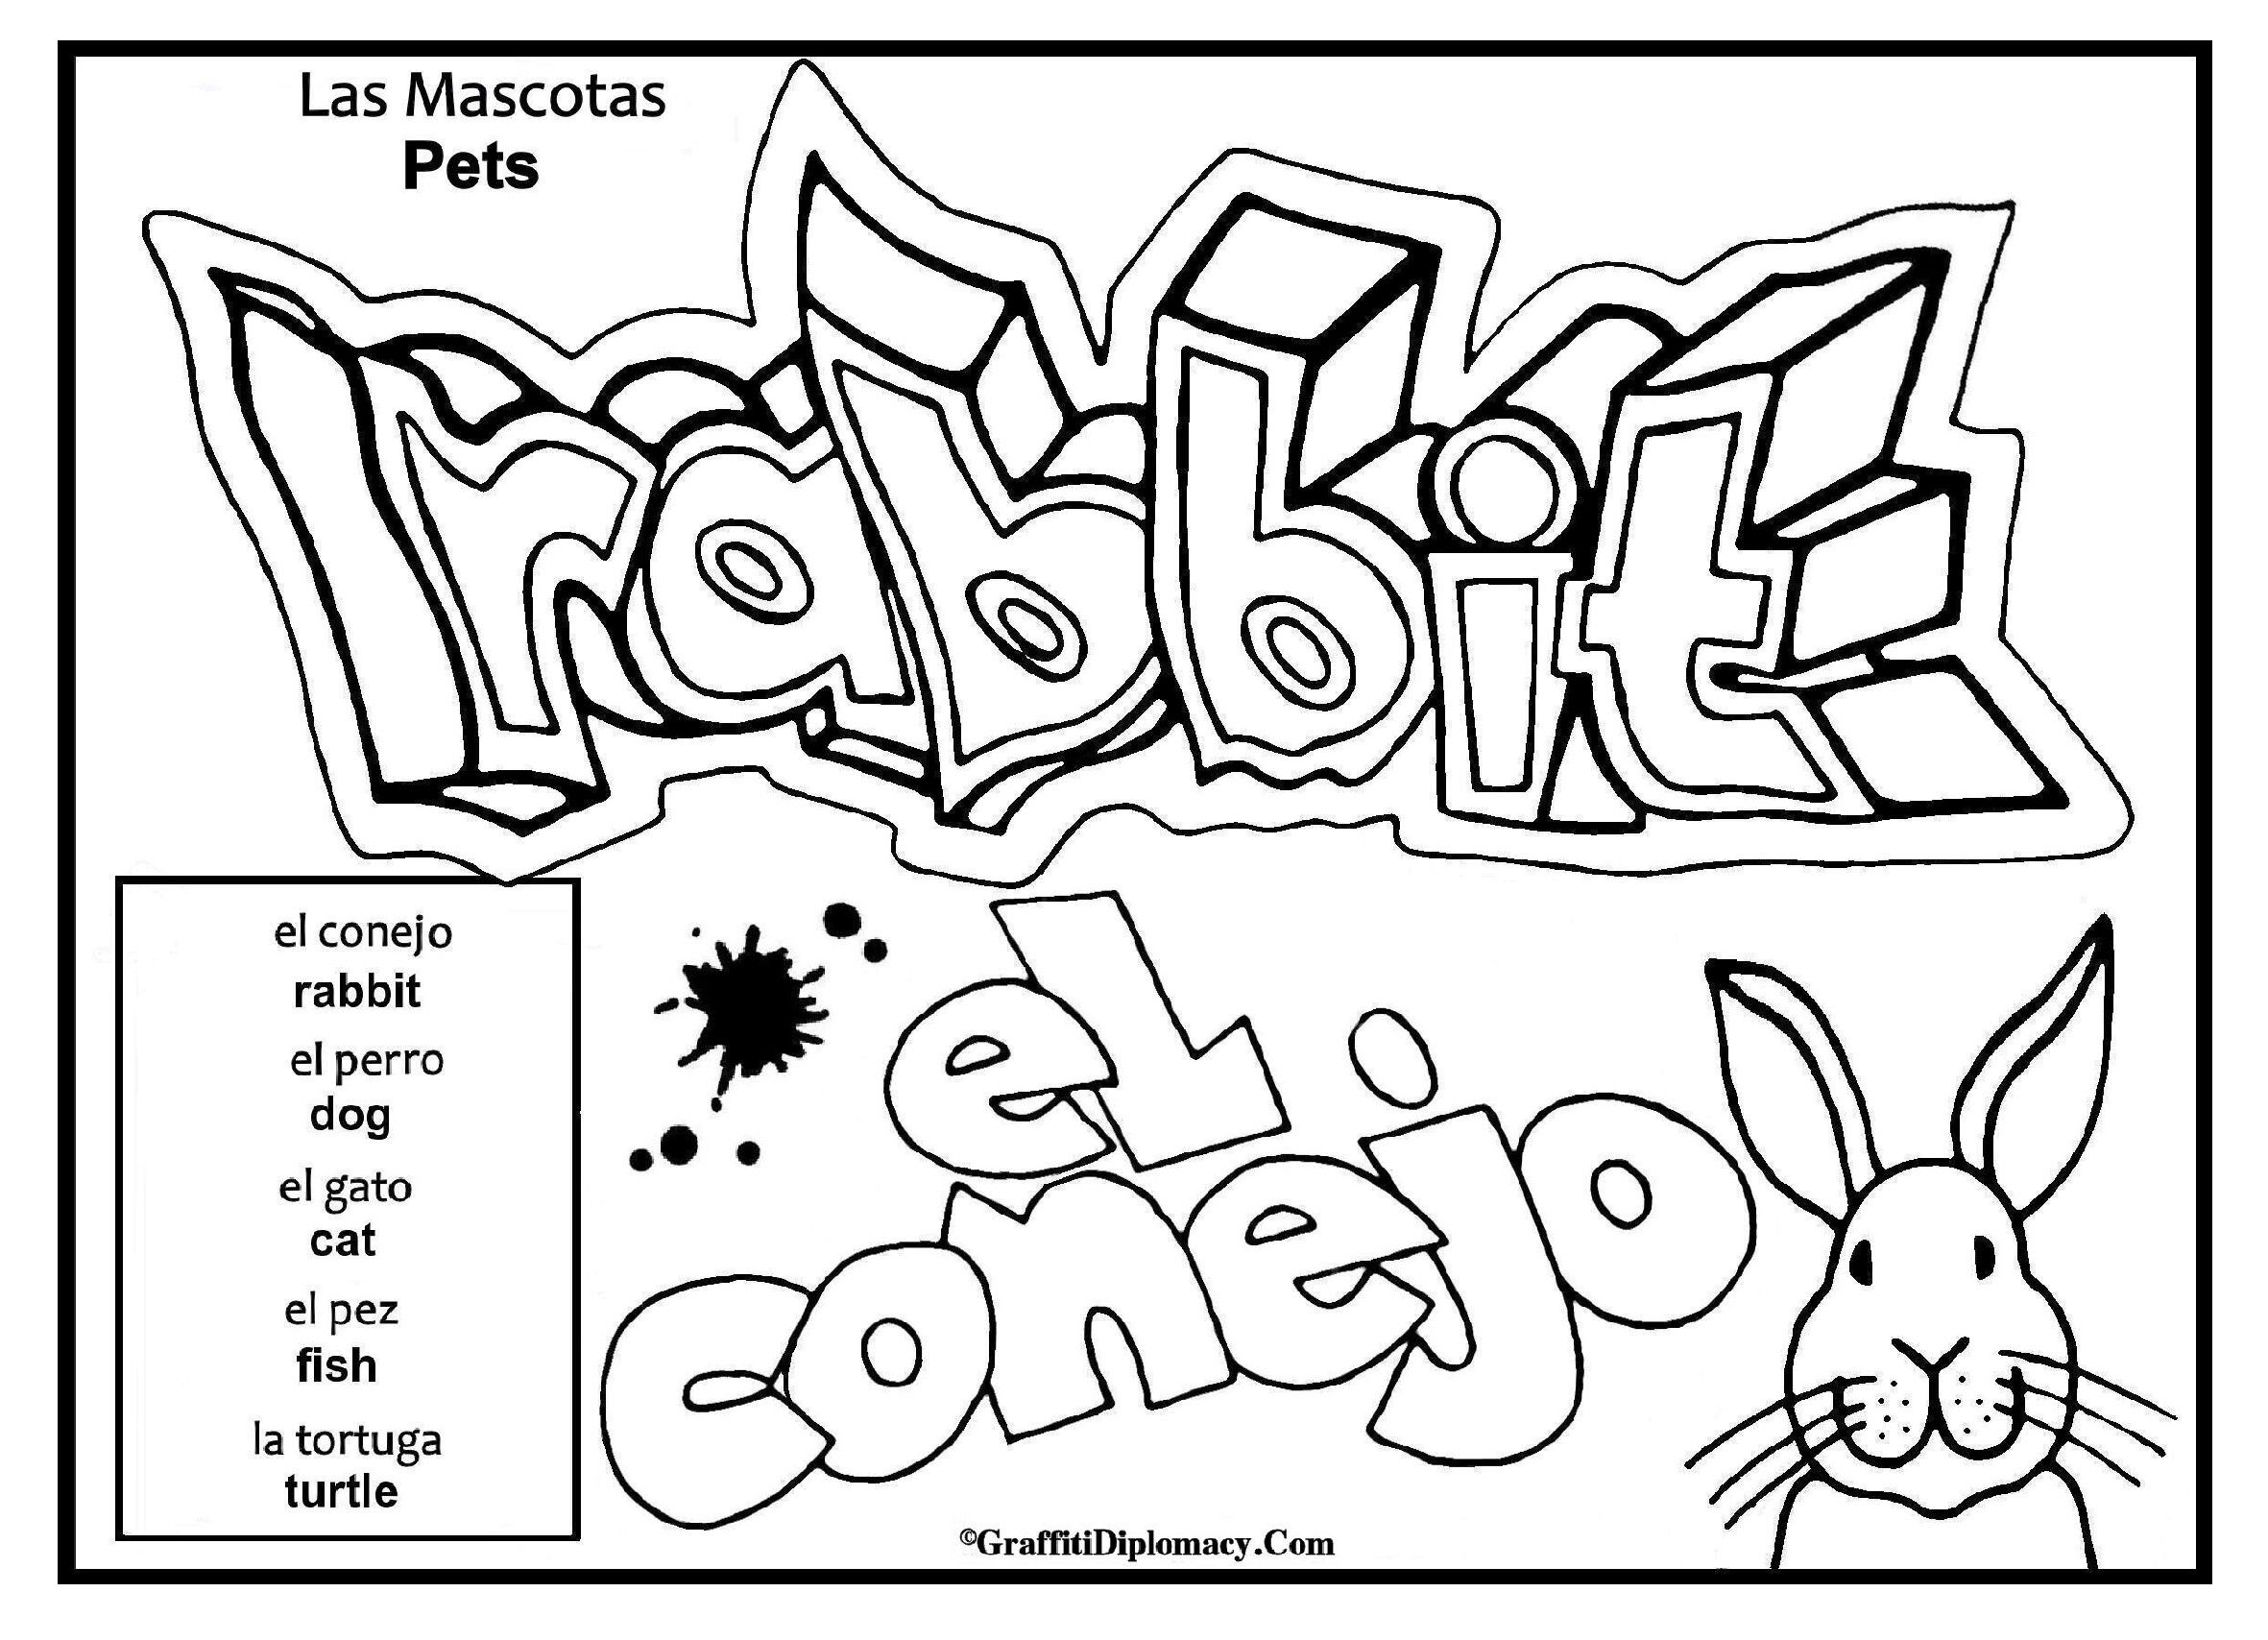 pets las mascotas spanish to english printable graffiti